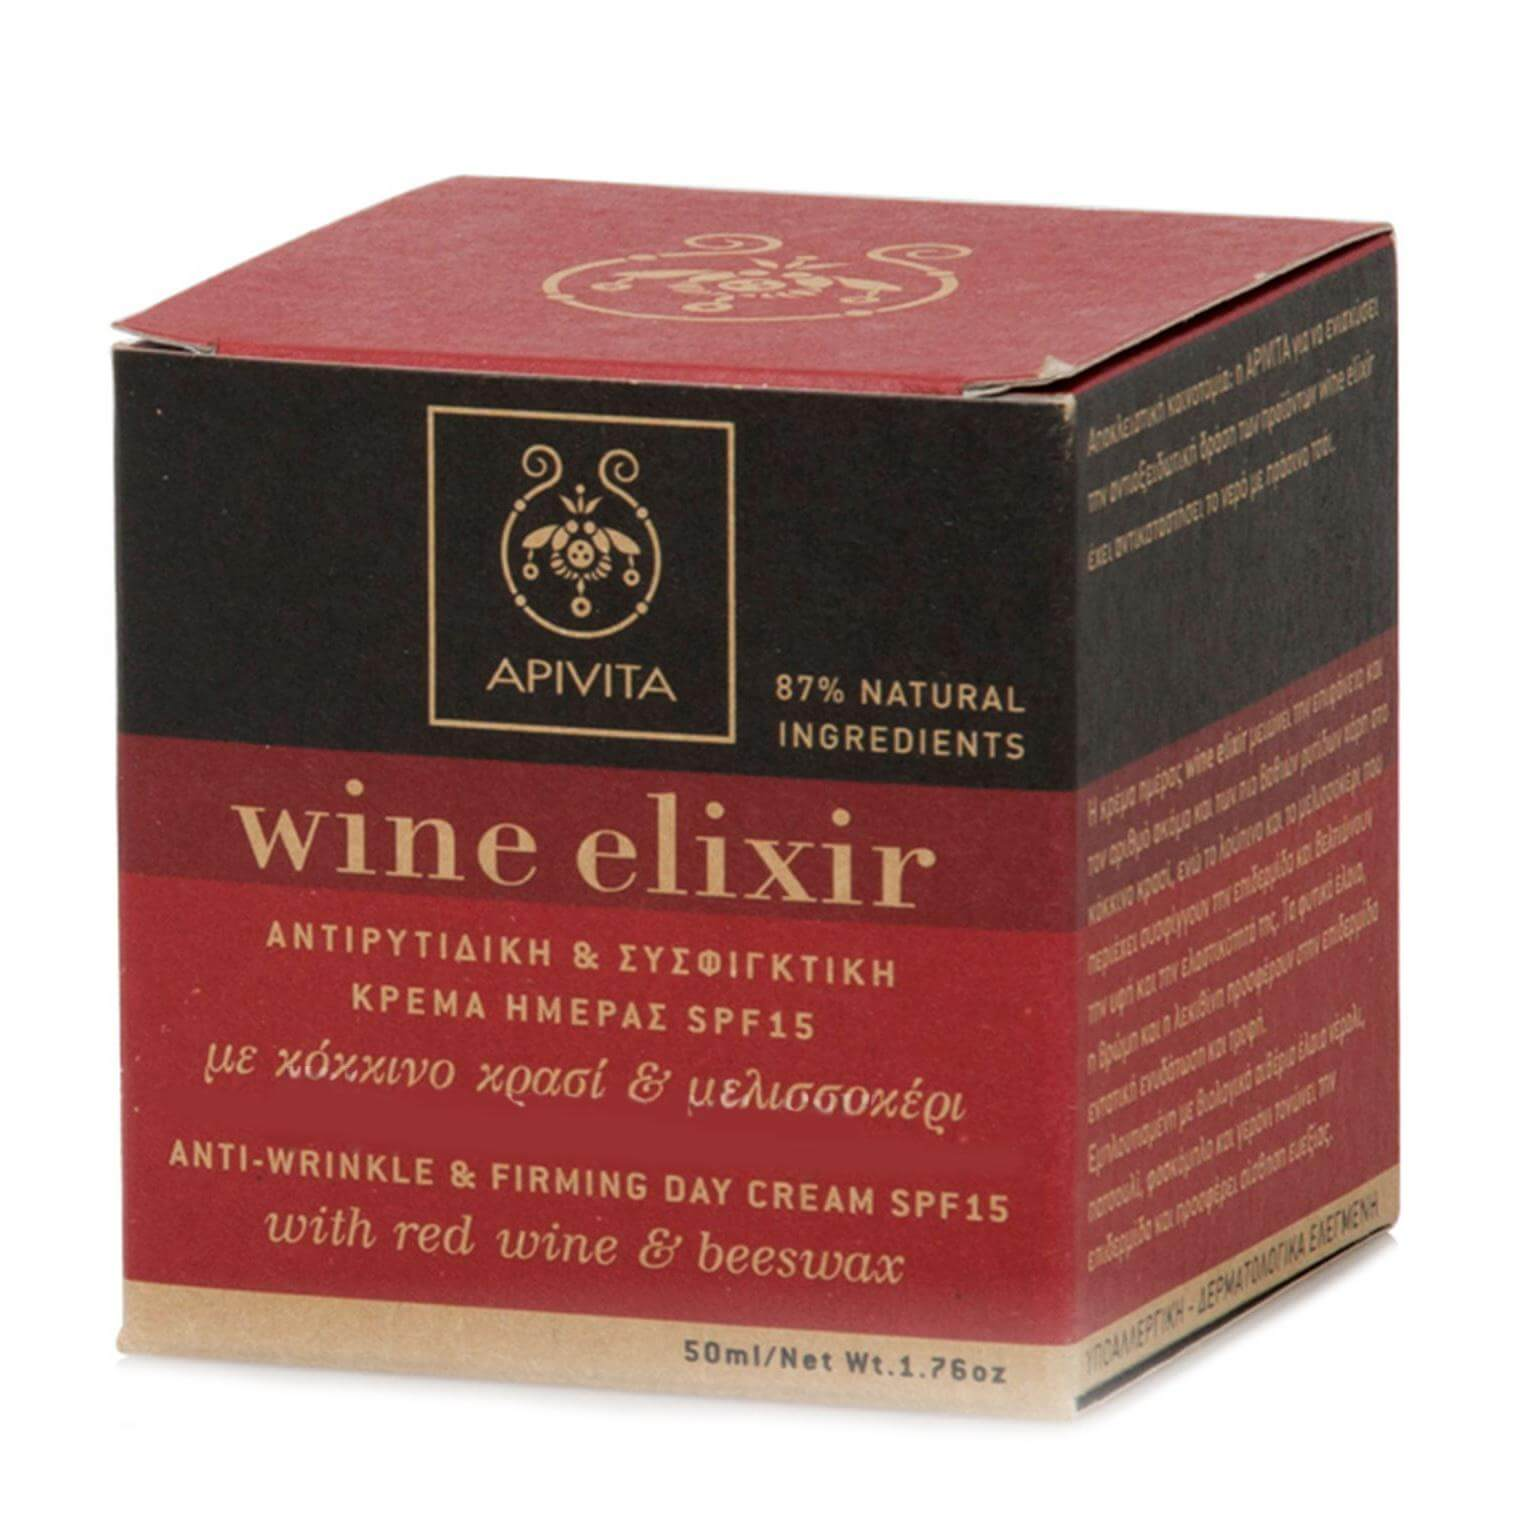 Apivita Wine Elixir Αντιρυτιδική και Συσφιγκτική Κρέμα Ημέρας SPF 15 Με Κερί Μελισσών & Κόκκινο Κρασί 50ml